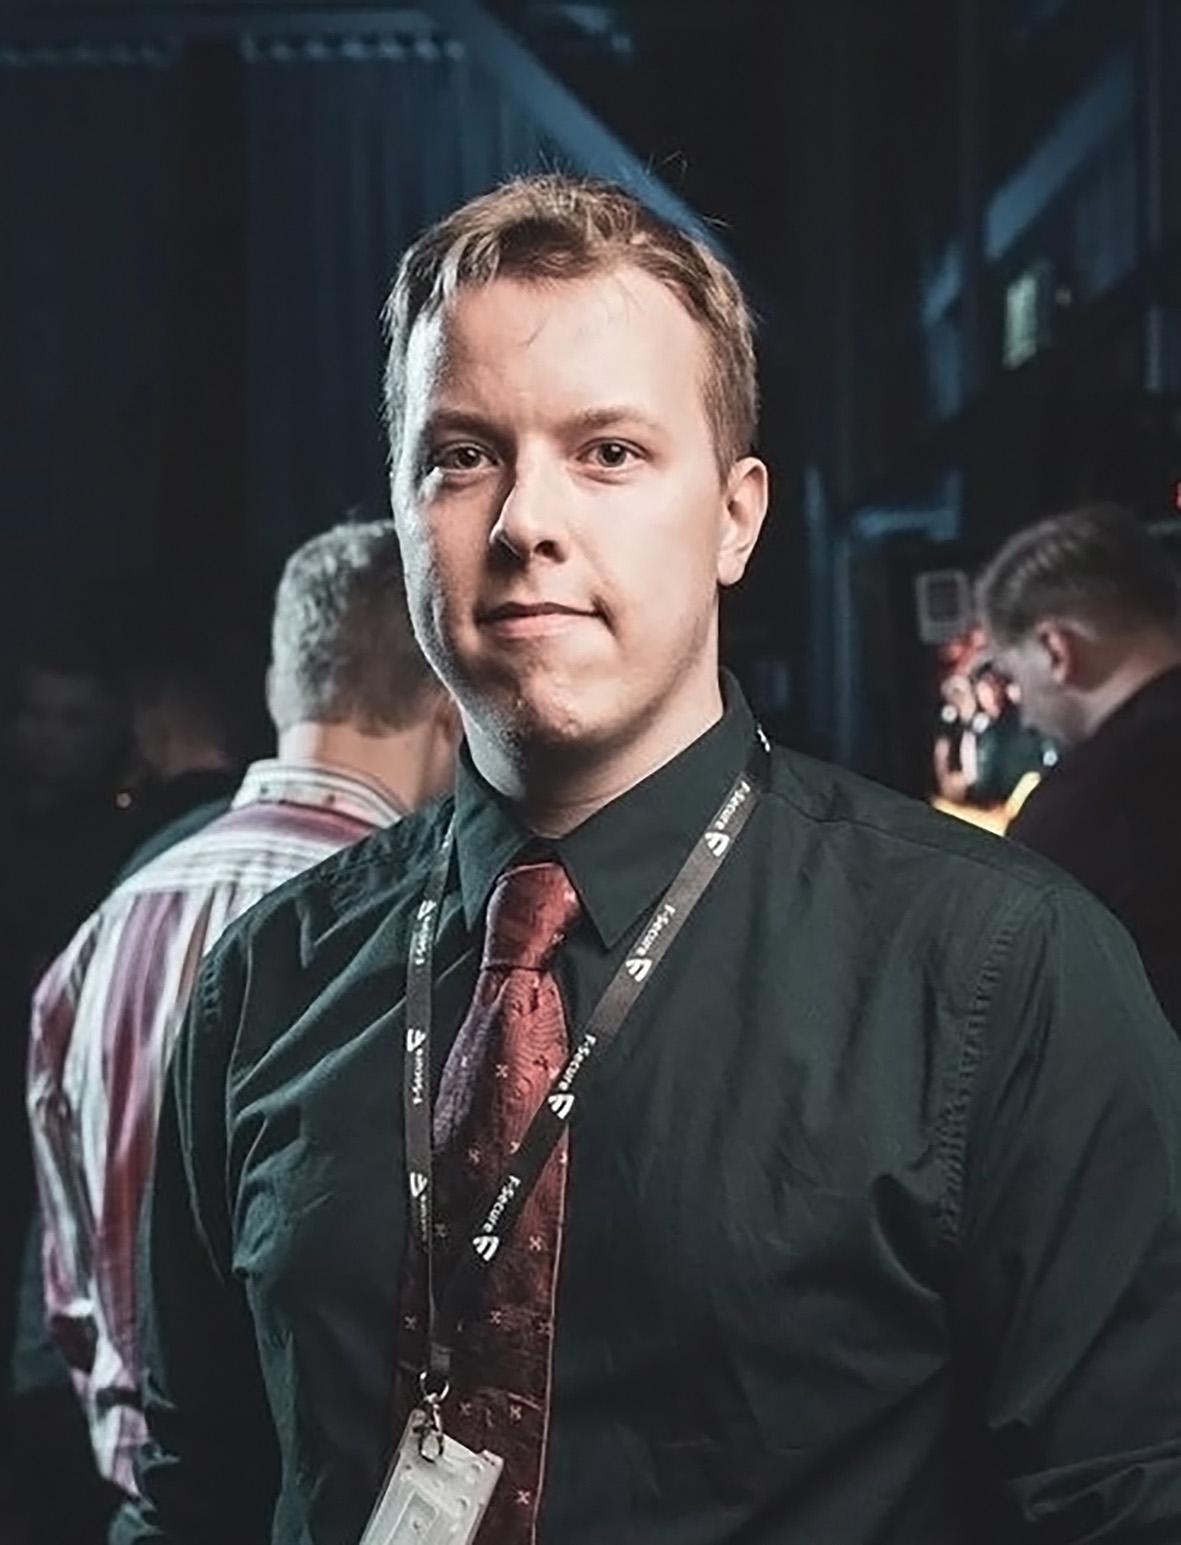 Sami Ruohonen, Threat Researcher bei F-Secure